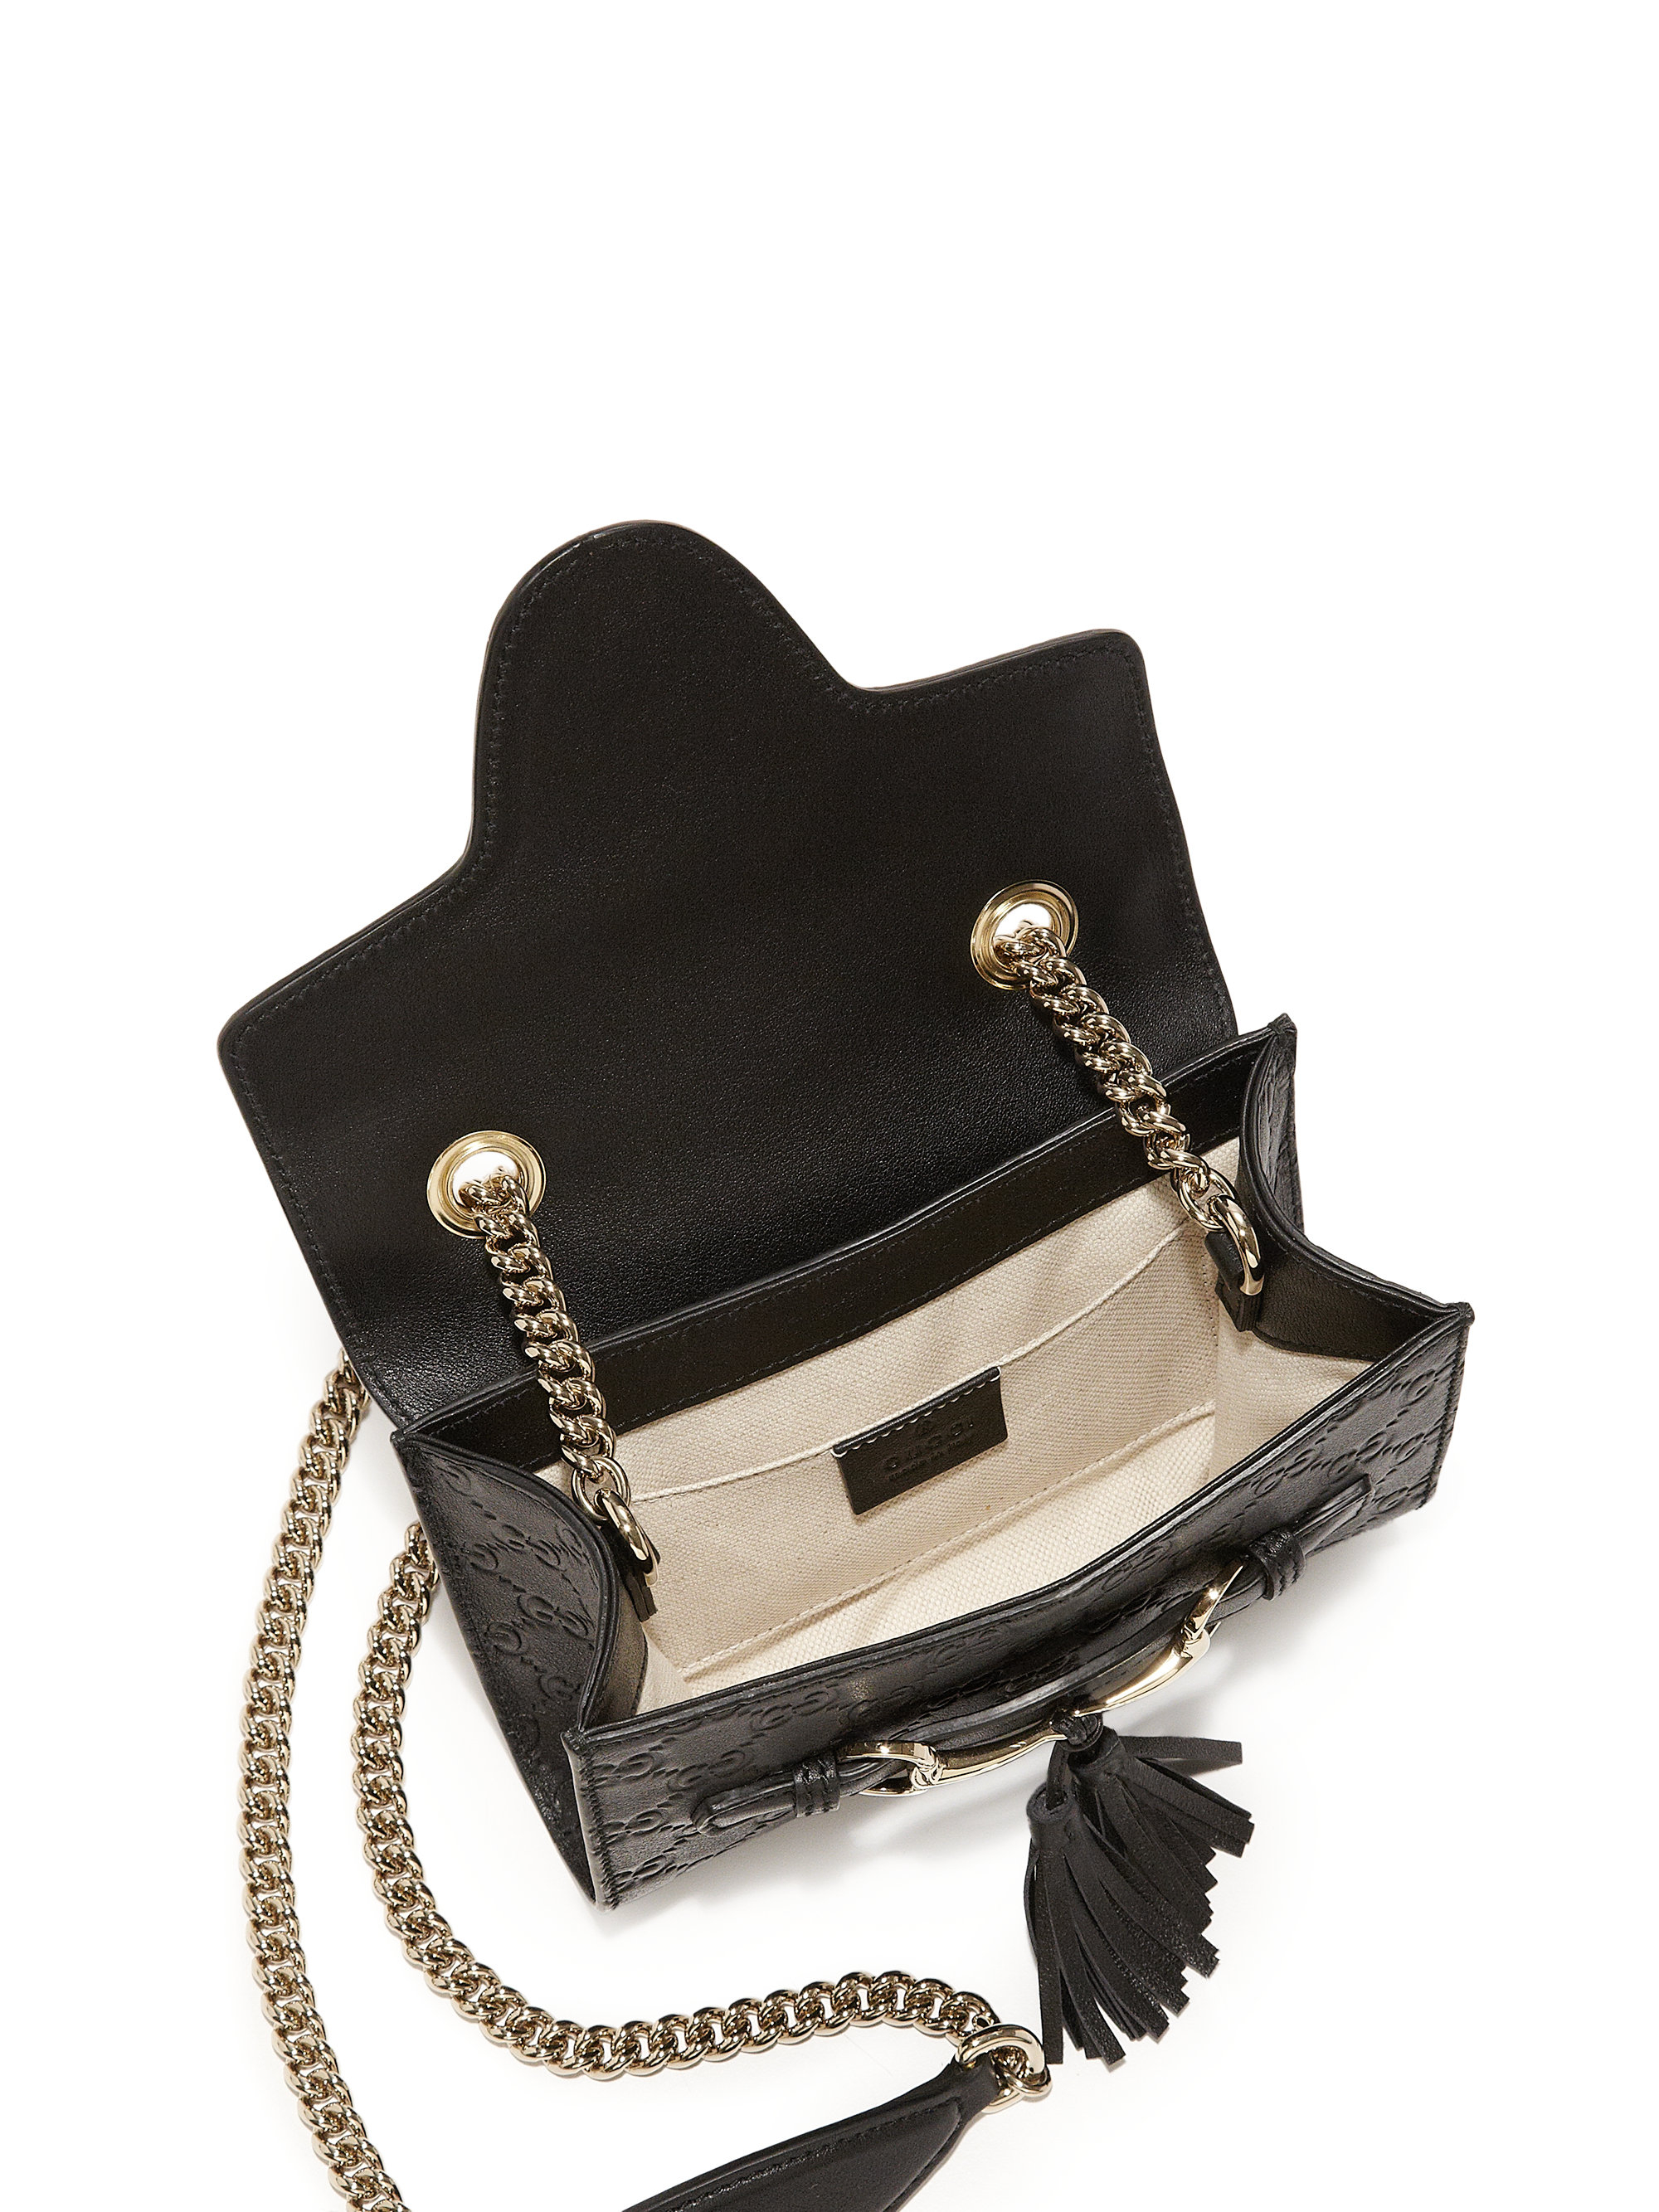 bb76d838ef62 Gucci Emily Ssima Leather Chain Mini Bag in Black - Lyst